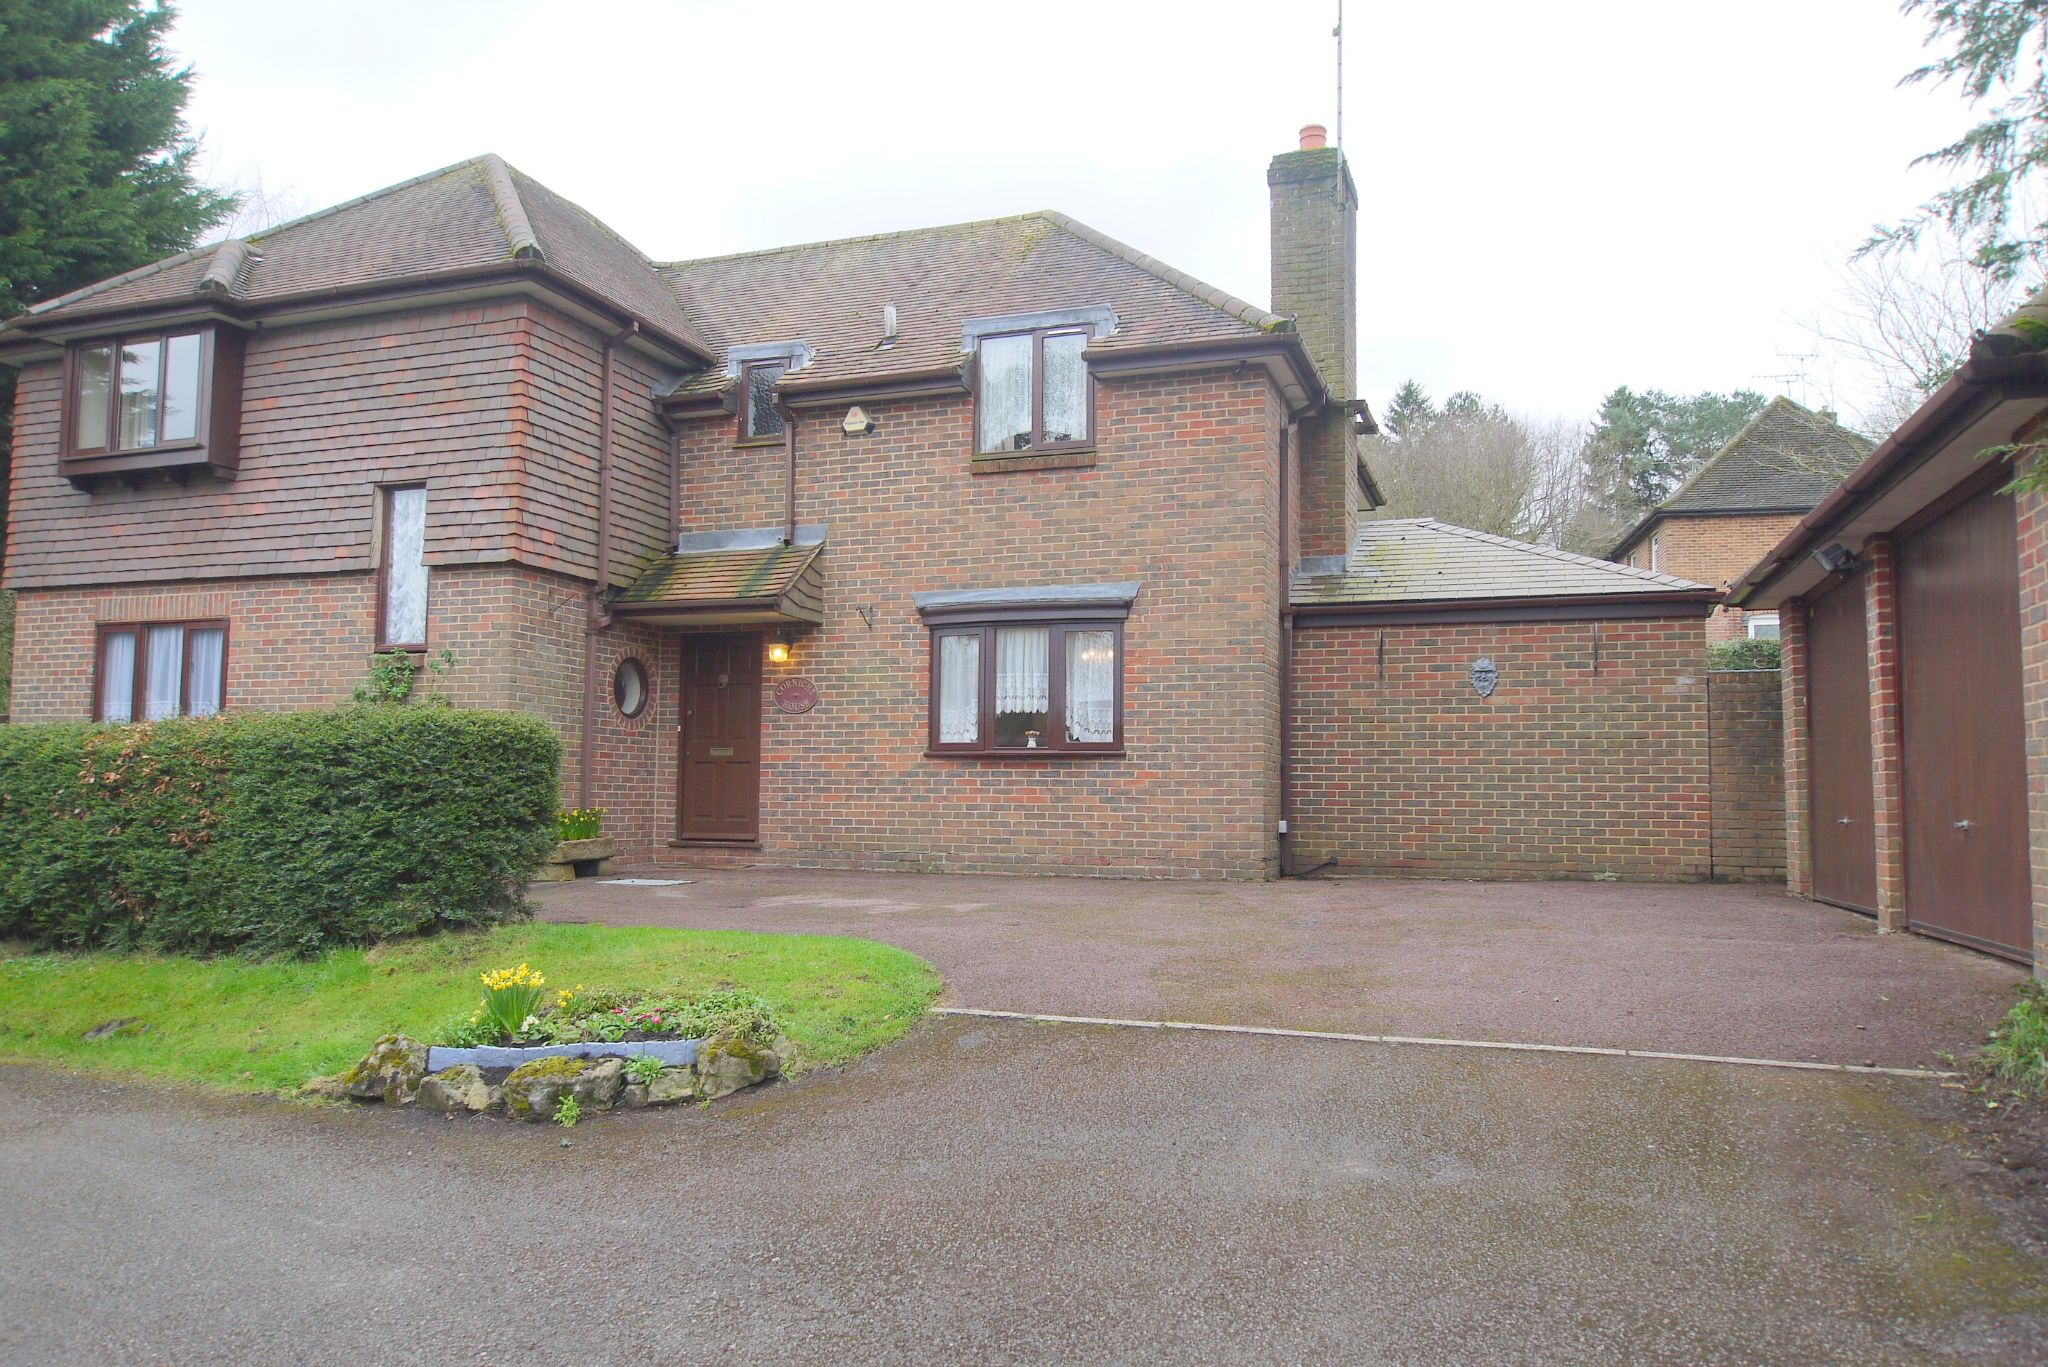 4 bedroom detached house Sold in Sevenoaks - Photograph 1